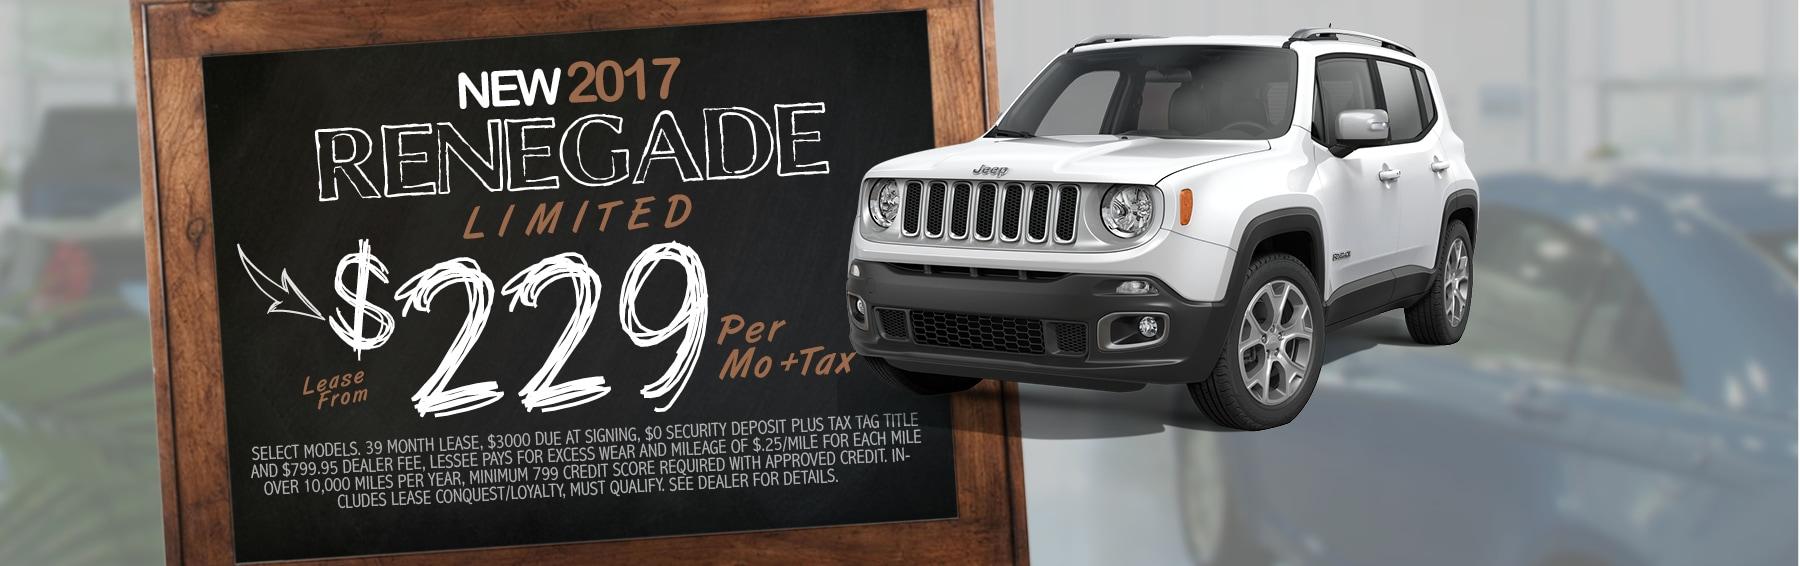 BMW Fort Pierce >> Arrigo Ft Pierce | Chrysler Dodge Jeep RAM FIAT Dealer ...